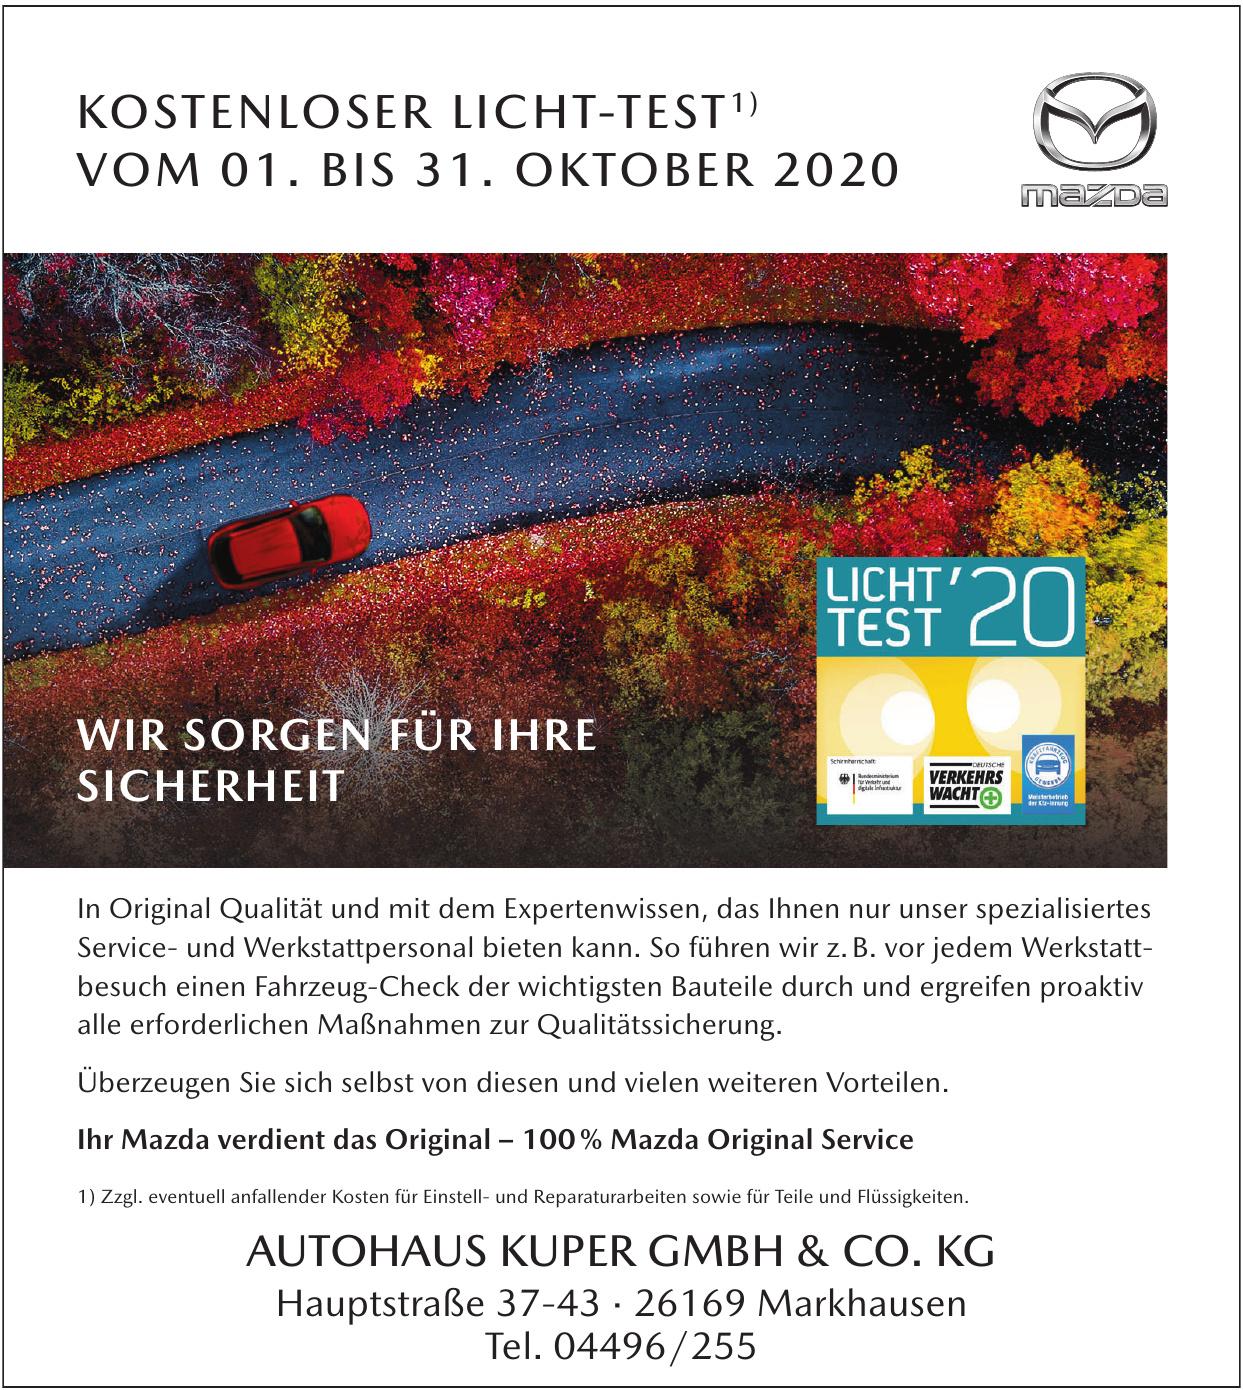 Autohaus Kuper Gmbh & Co. KG